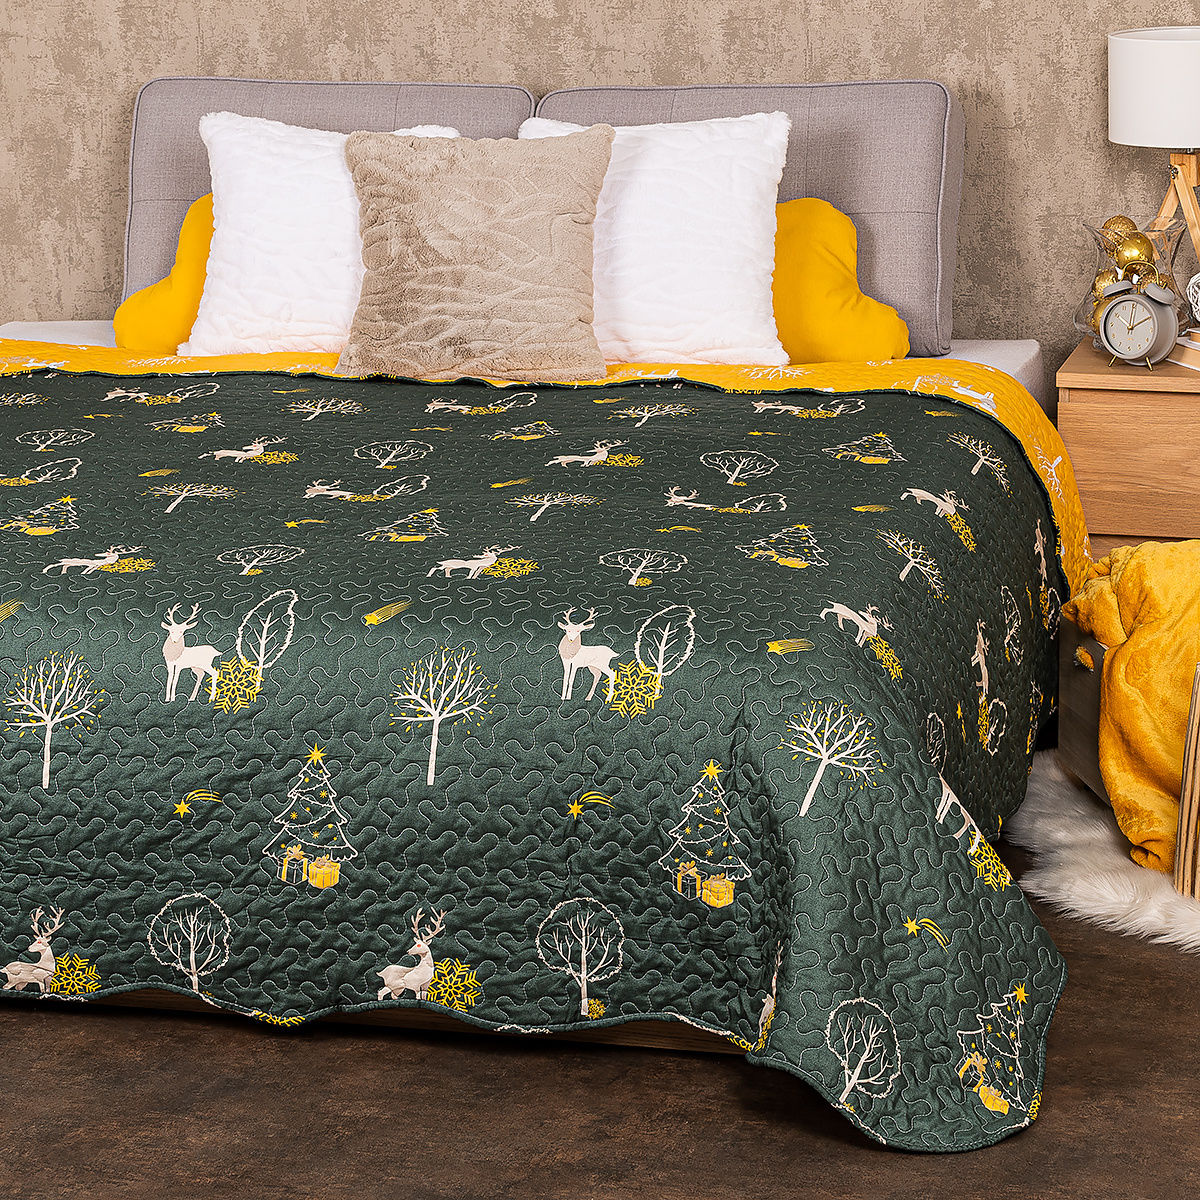 4Home Narzuta na łóżko Forest Dream, 220 x 240 cm